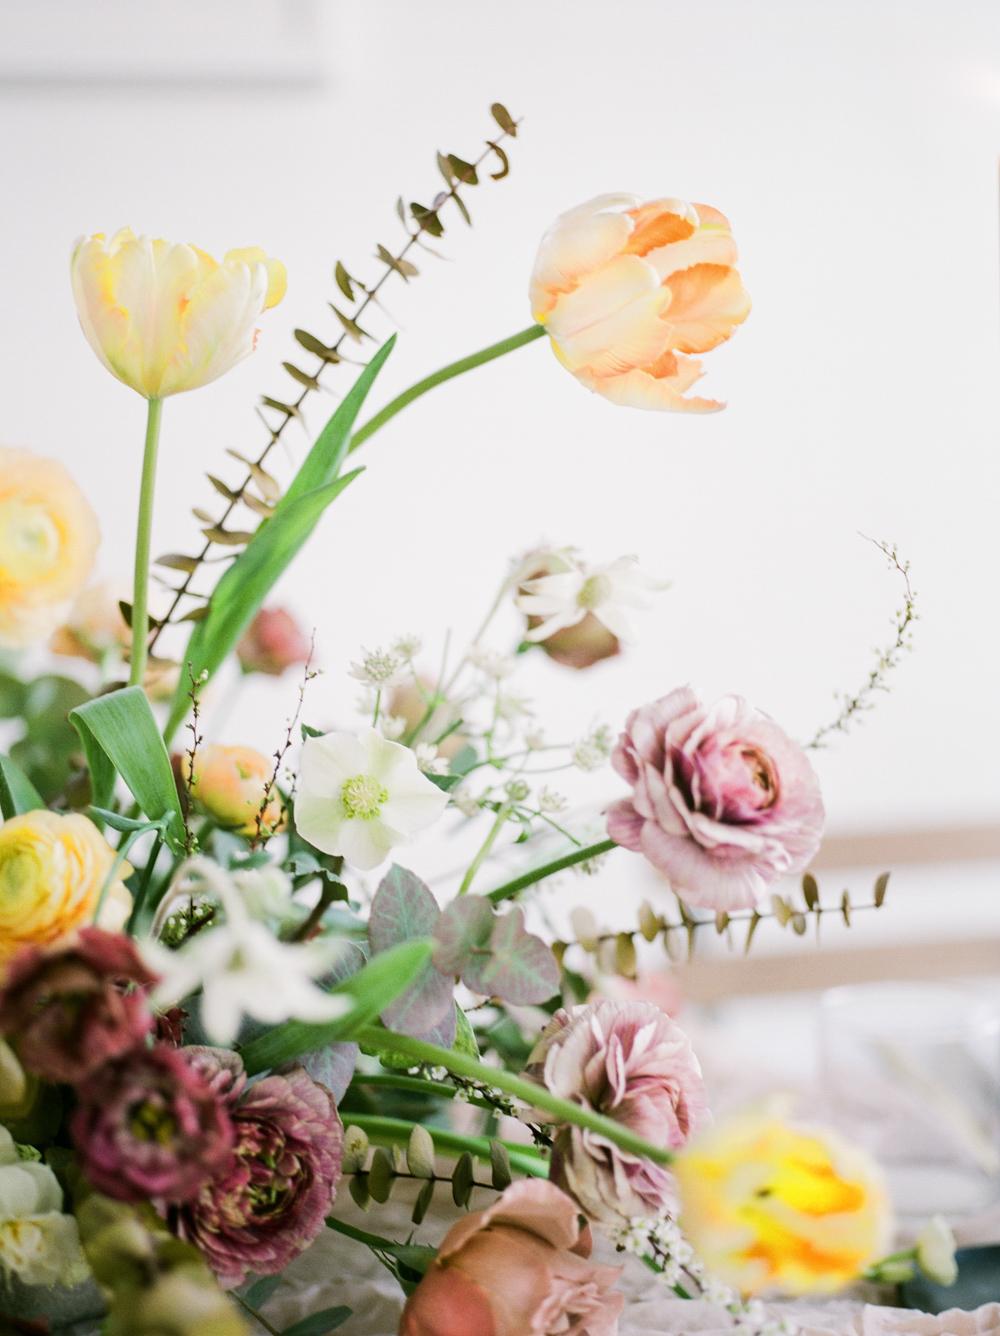 Christine-Gosch-Lexie-Sandberg-Carpe-diem-flowers-florals-design-wedding-flowers-salt-lake-city-branding-photos-styling-bridal-bouquet-centerpieces-film-photographer-1.jpg